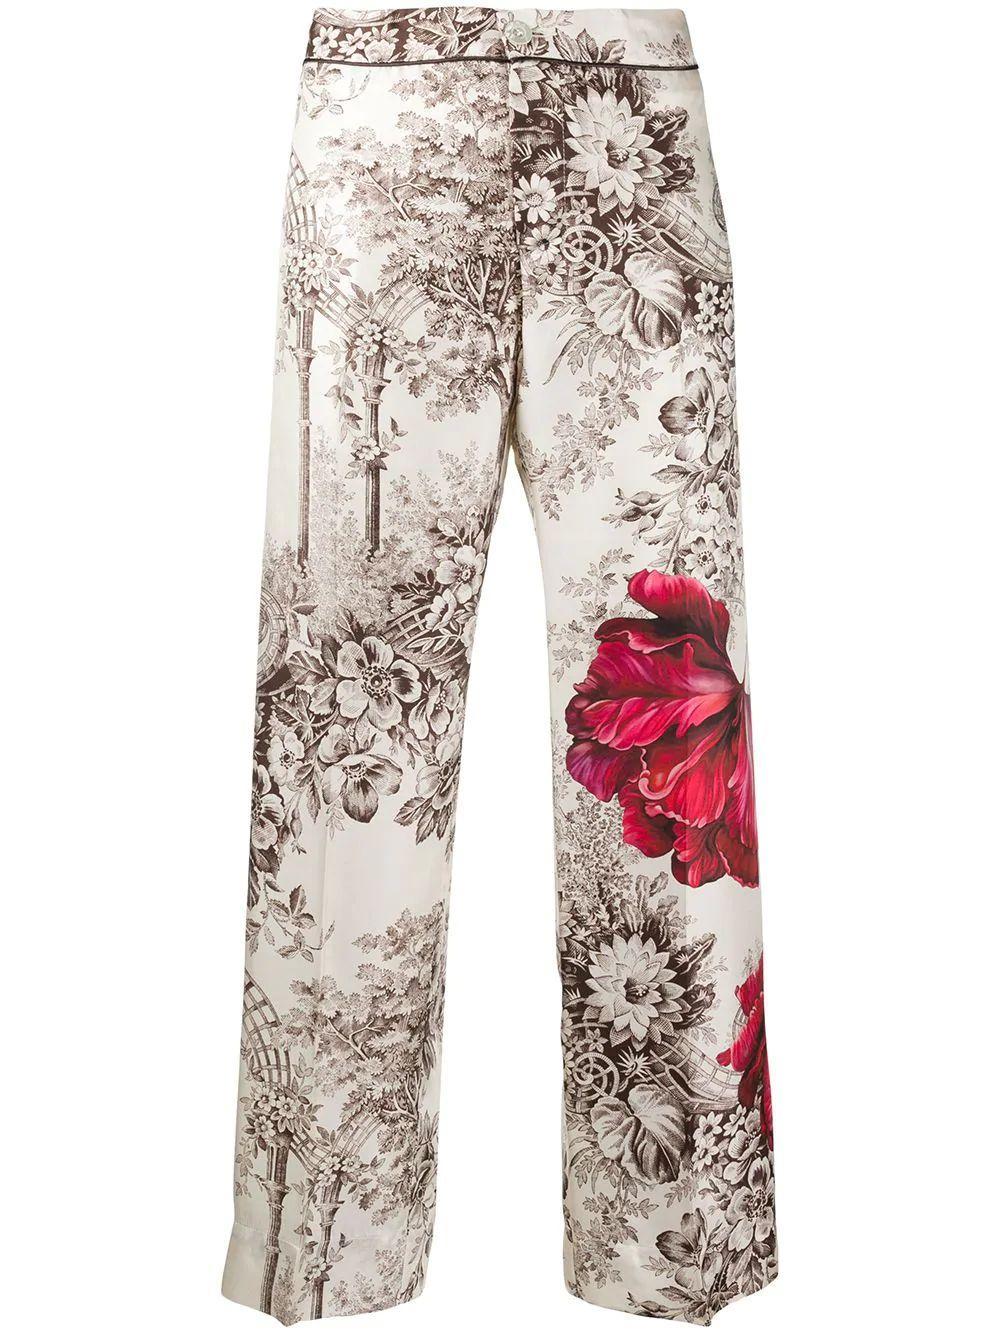 Flower Printed Piped Pants Item # PA002073-TE00442